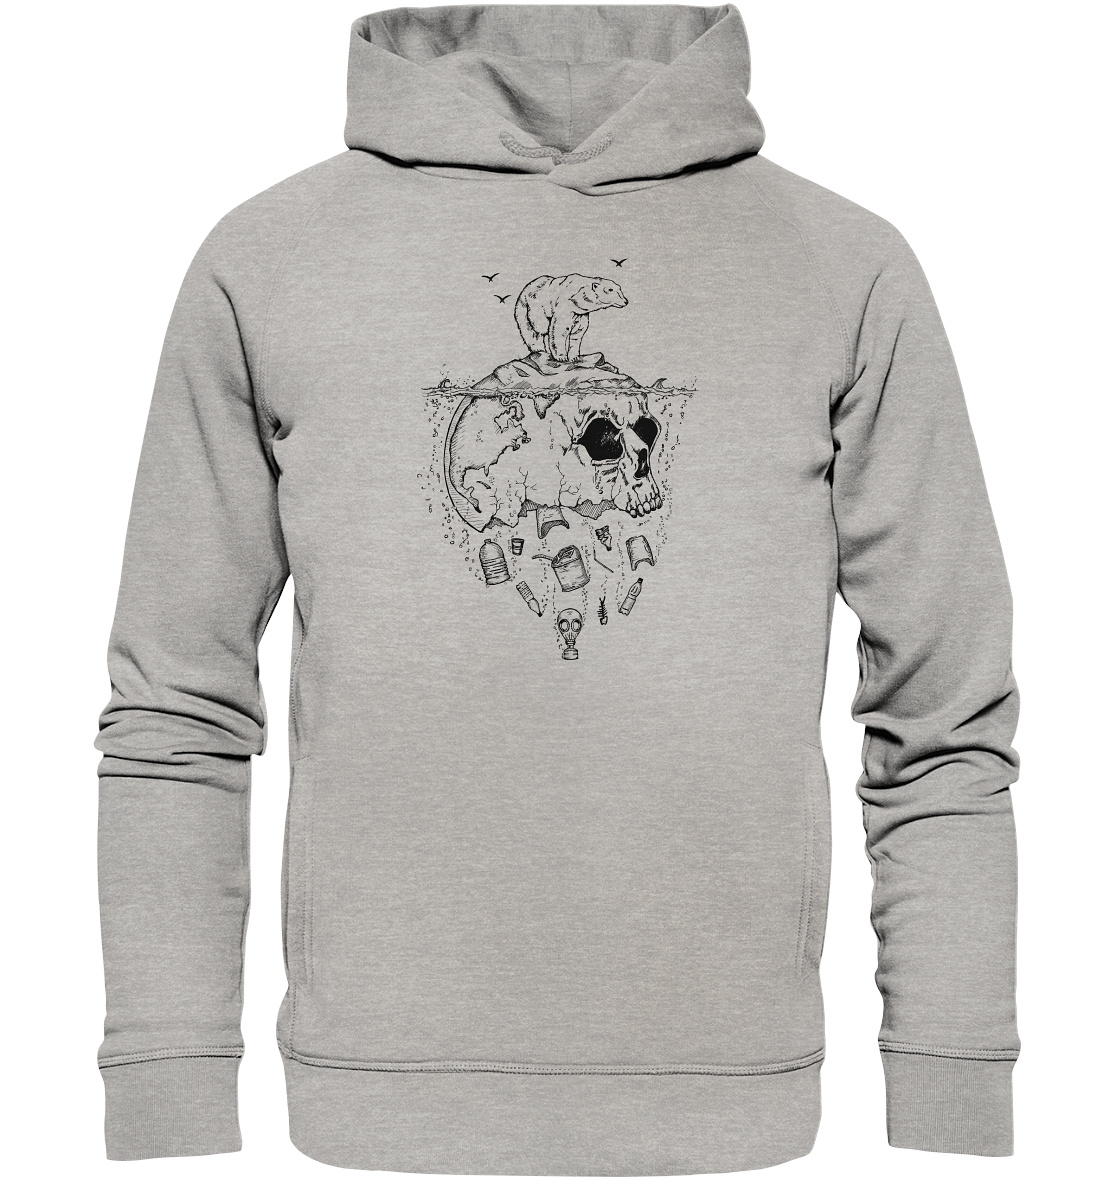 front-organic-fashion-hoodie-c2c1c0-1116x-3.png